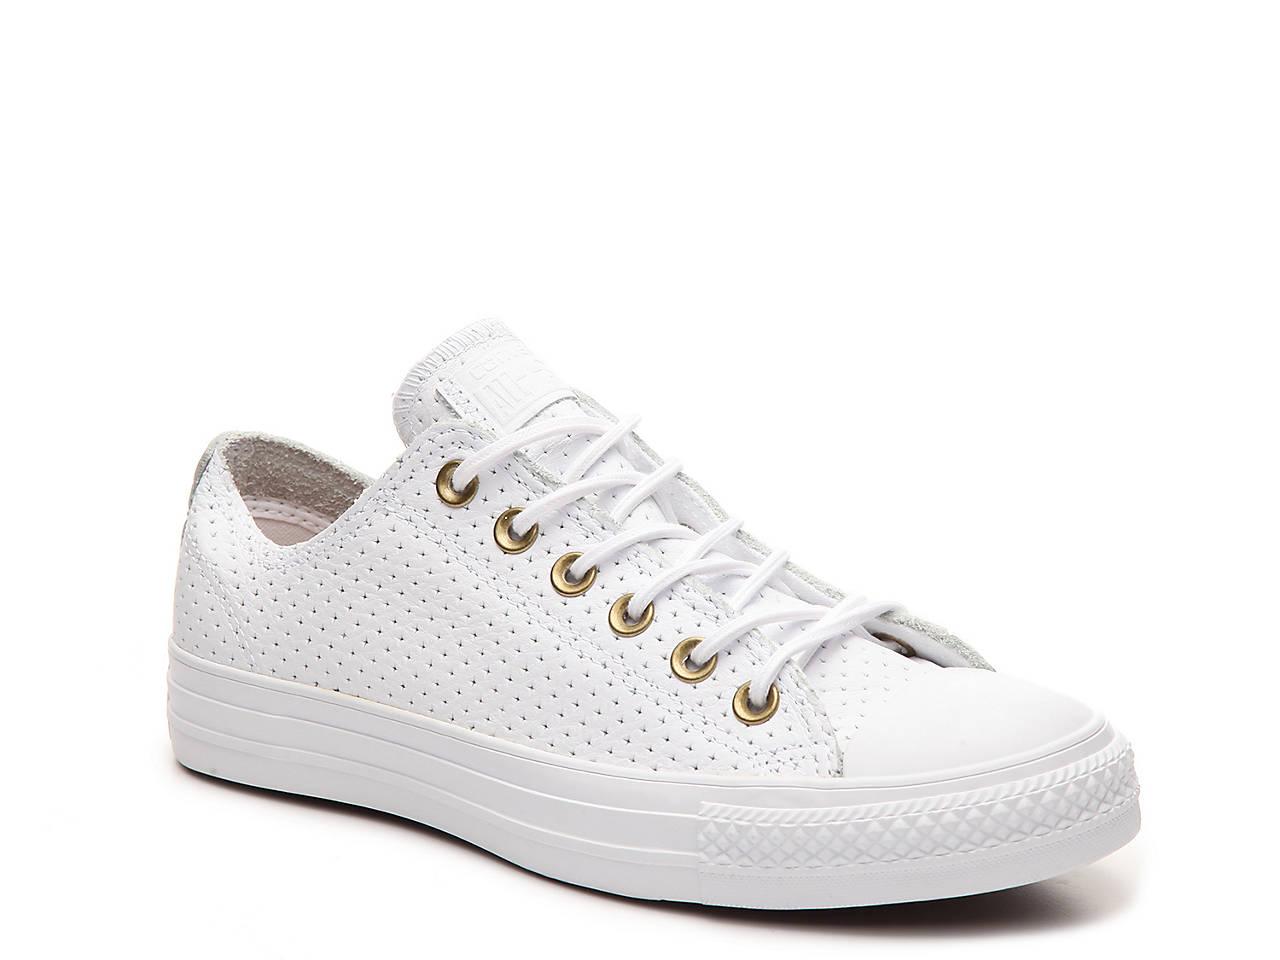 86654e406f34 Converse Chuck Taylor All Star Perforated Sneaker - Men s Men s ...